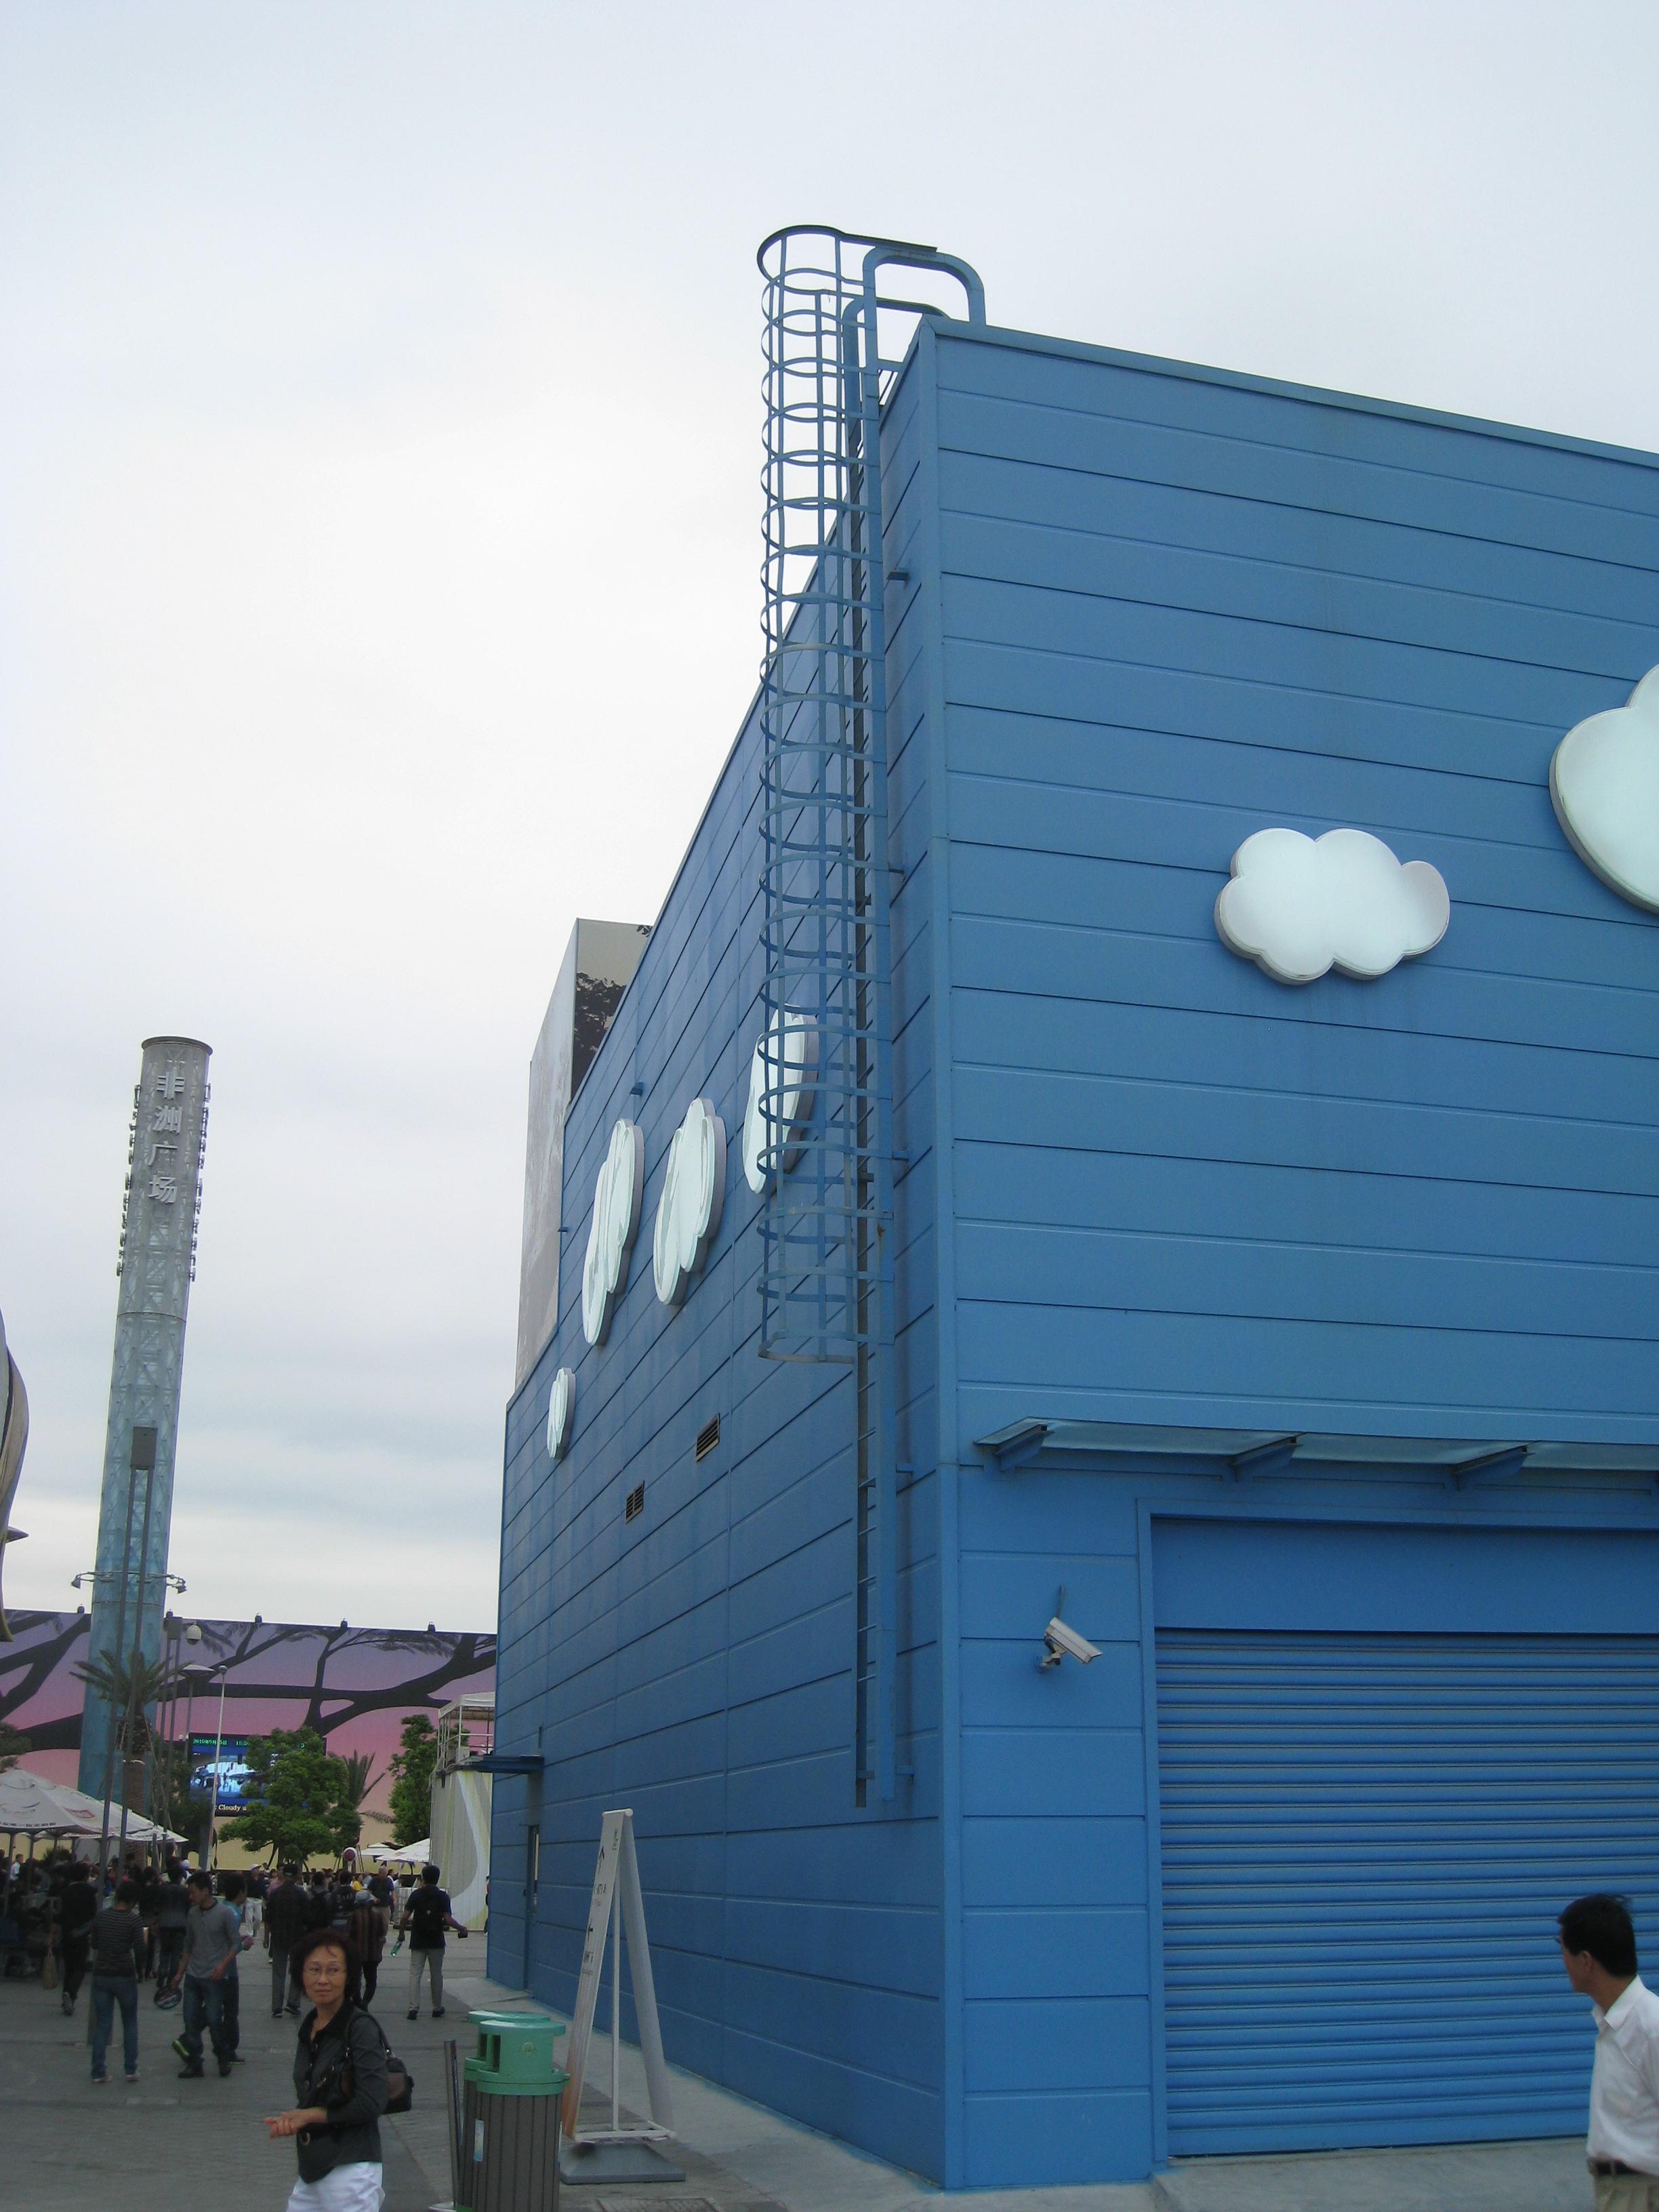 File:Echelle A Crinoline Expo Universelle Shanghai